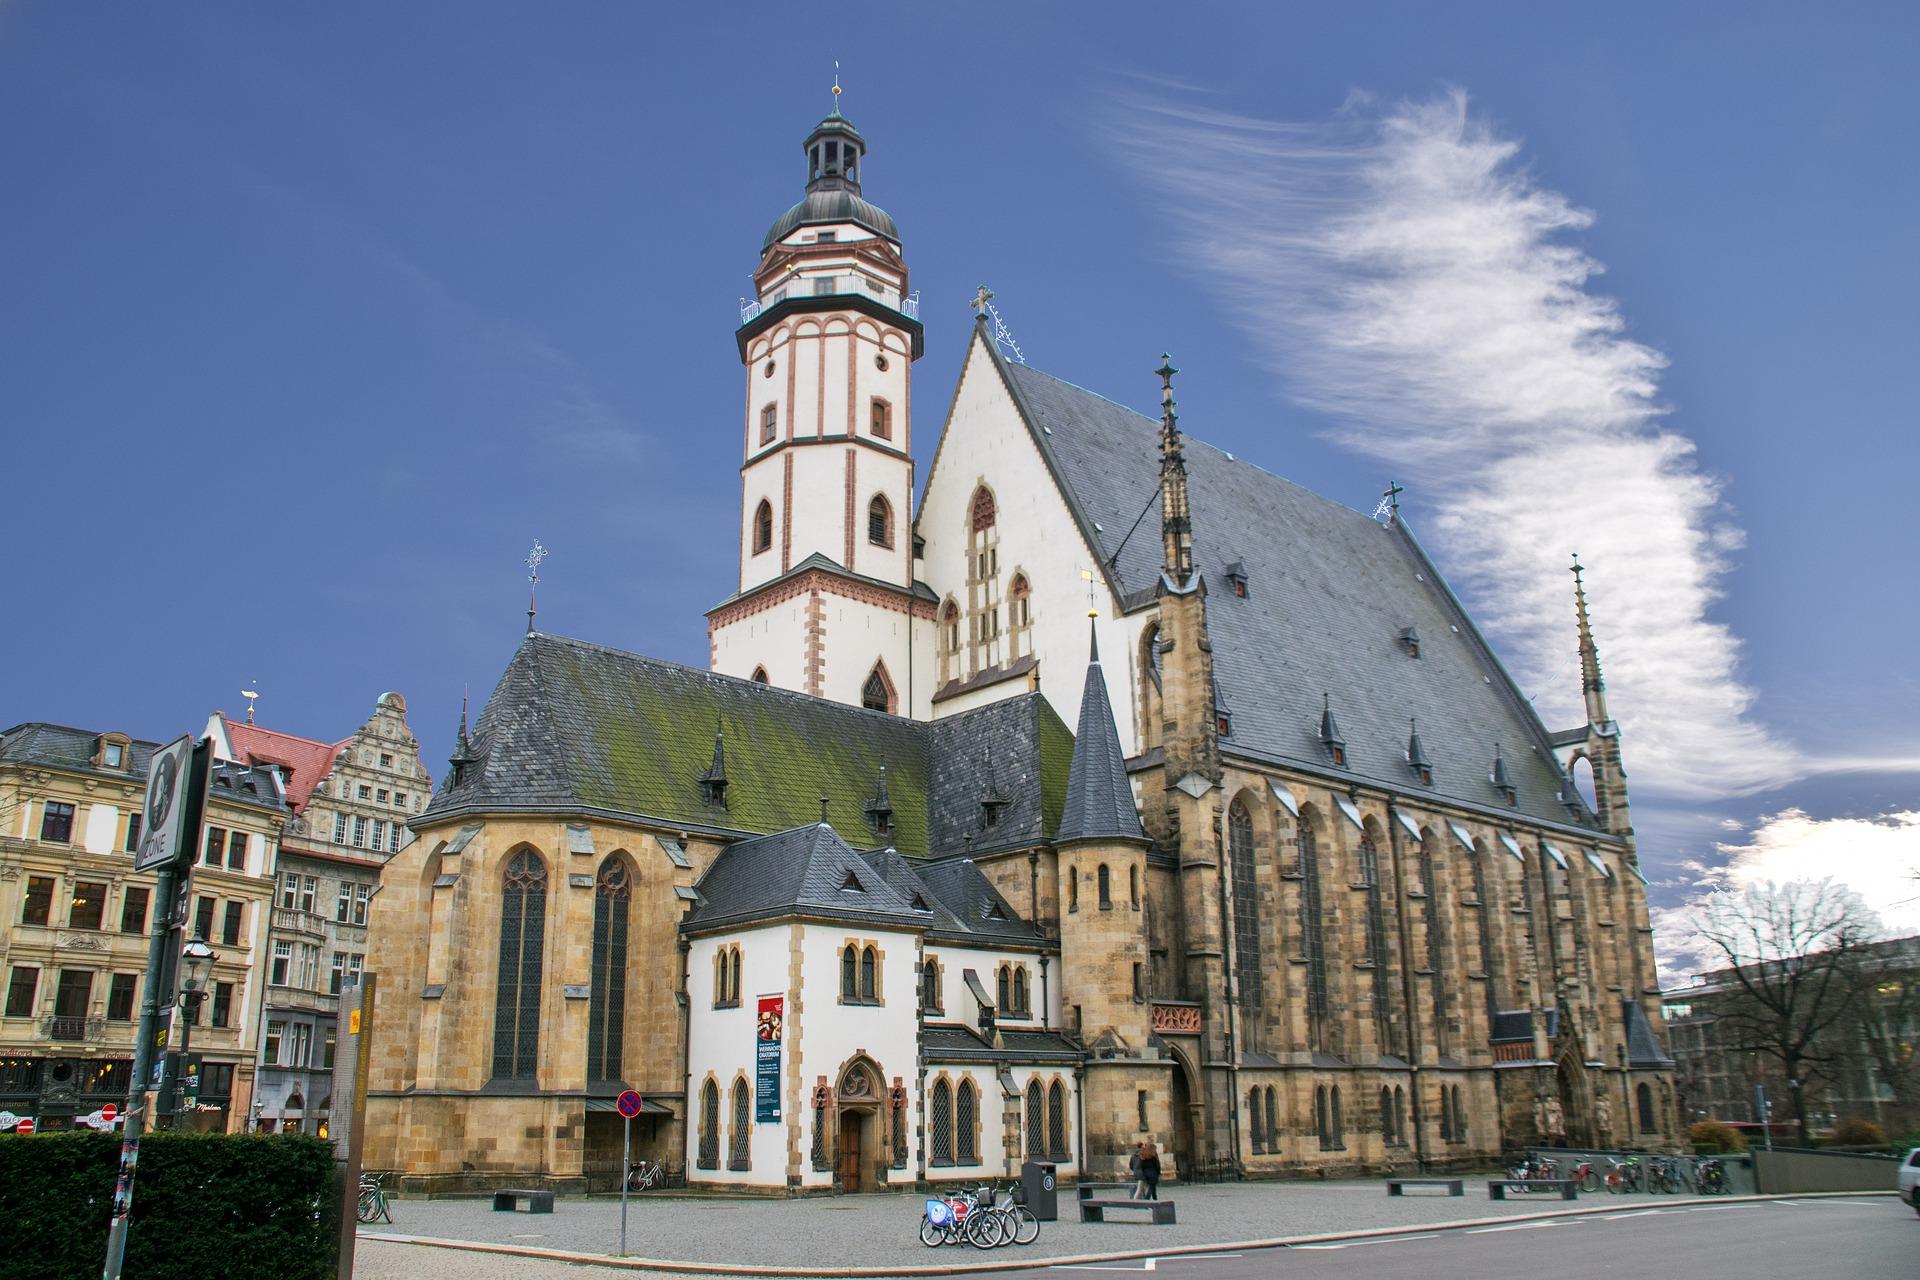 dialysepraxis-leipzig-urlaubsdialyse-thomaskirche